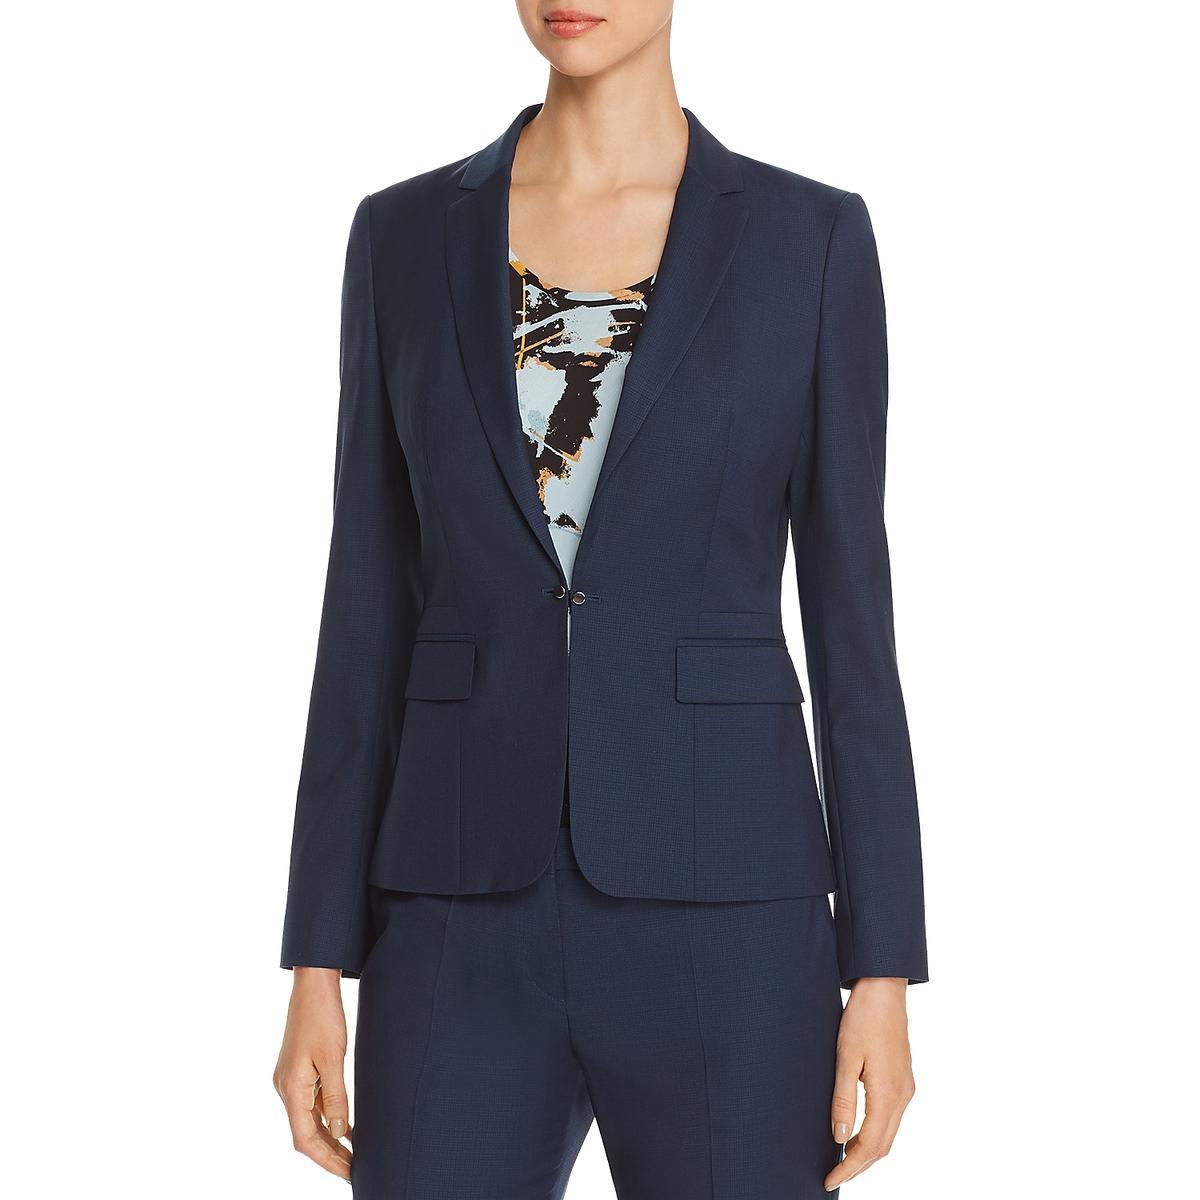 BOSS Hugo Boss Womens Jomanda Textured Two-Button Blazer Jacket BHFO 0897